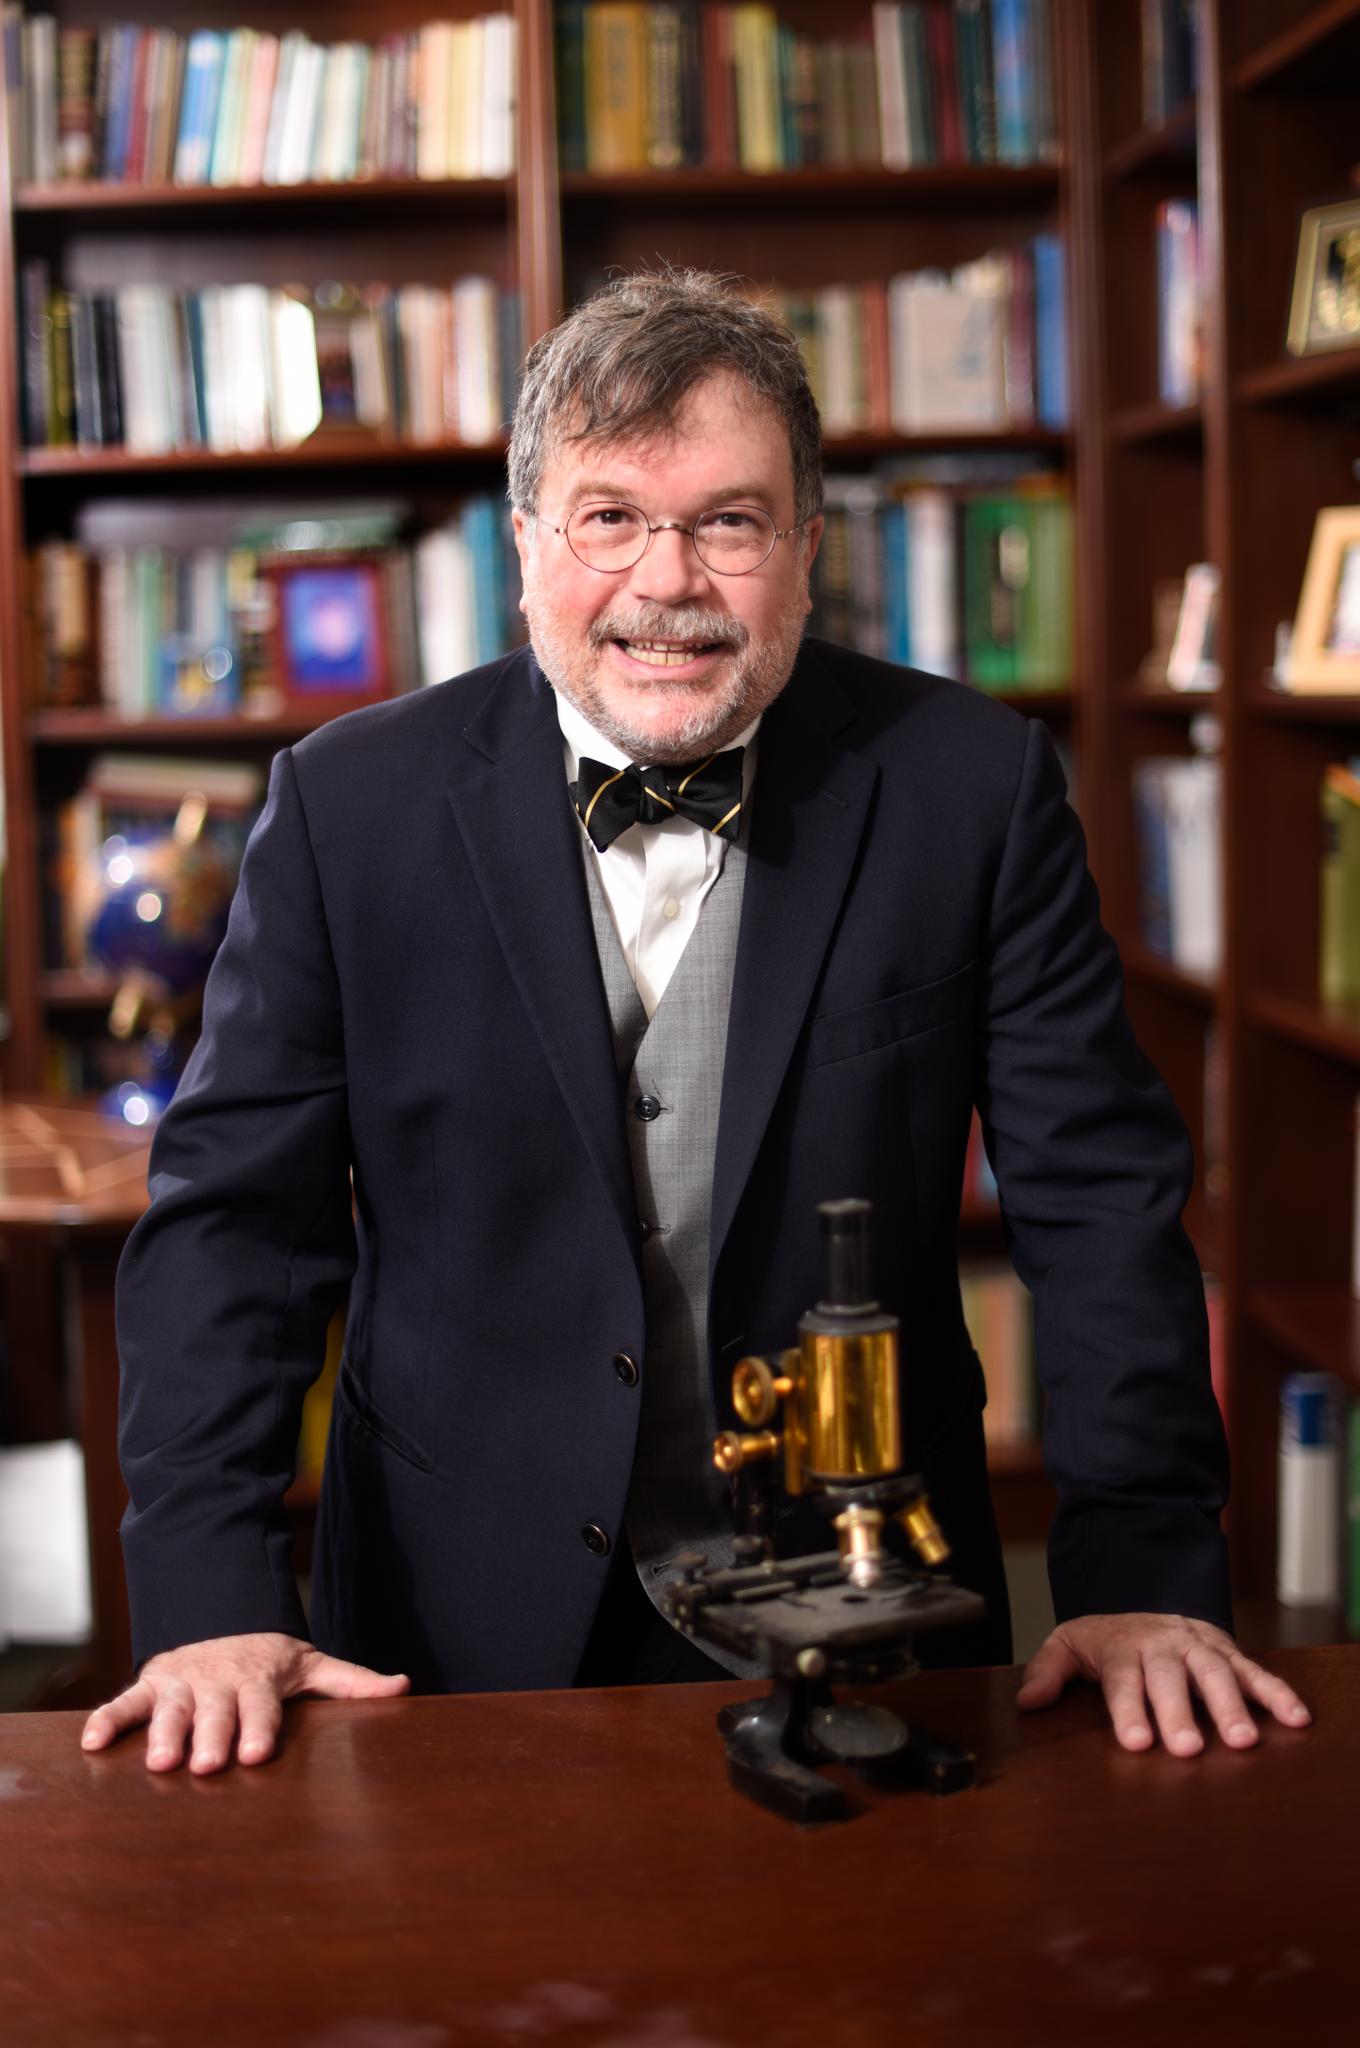 Dr. Peter J. Hotez